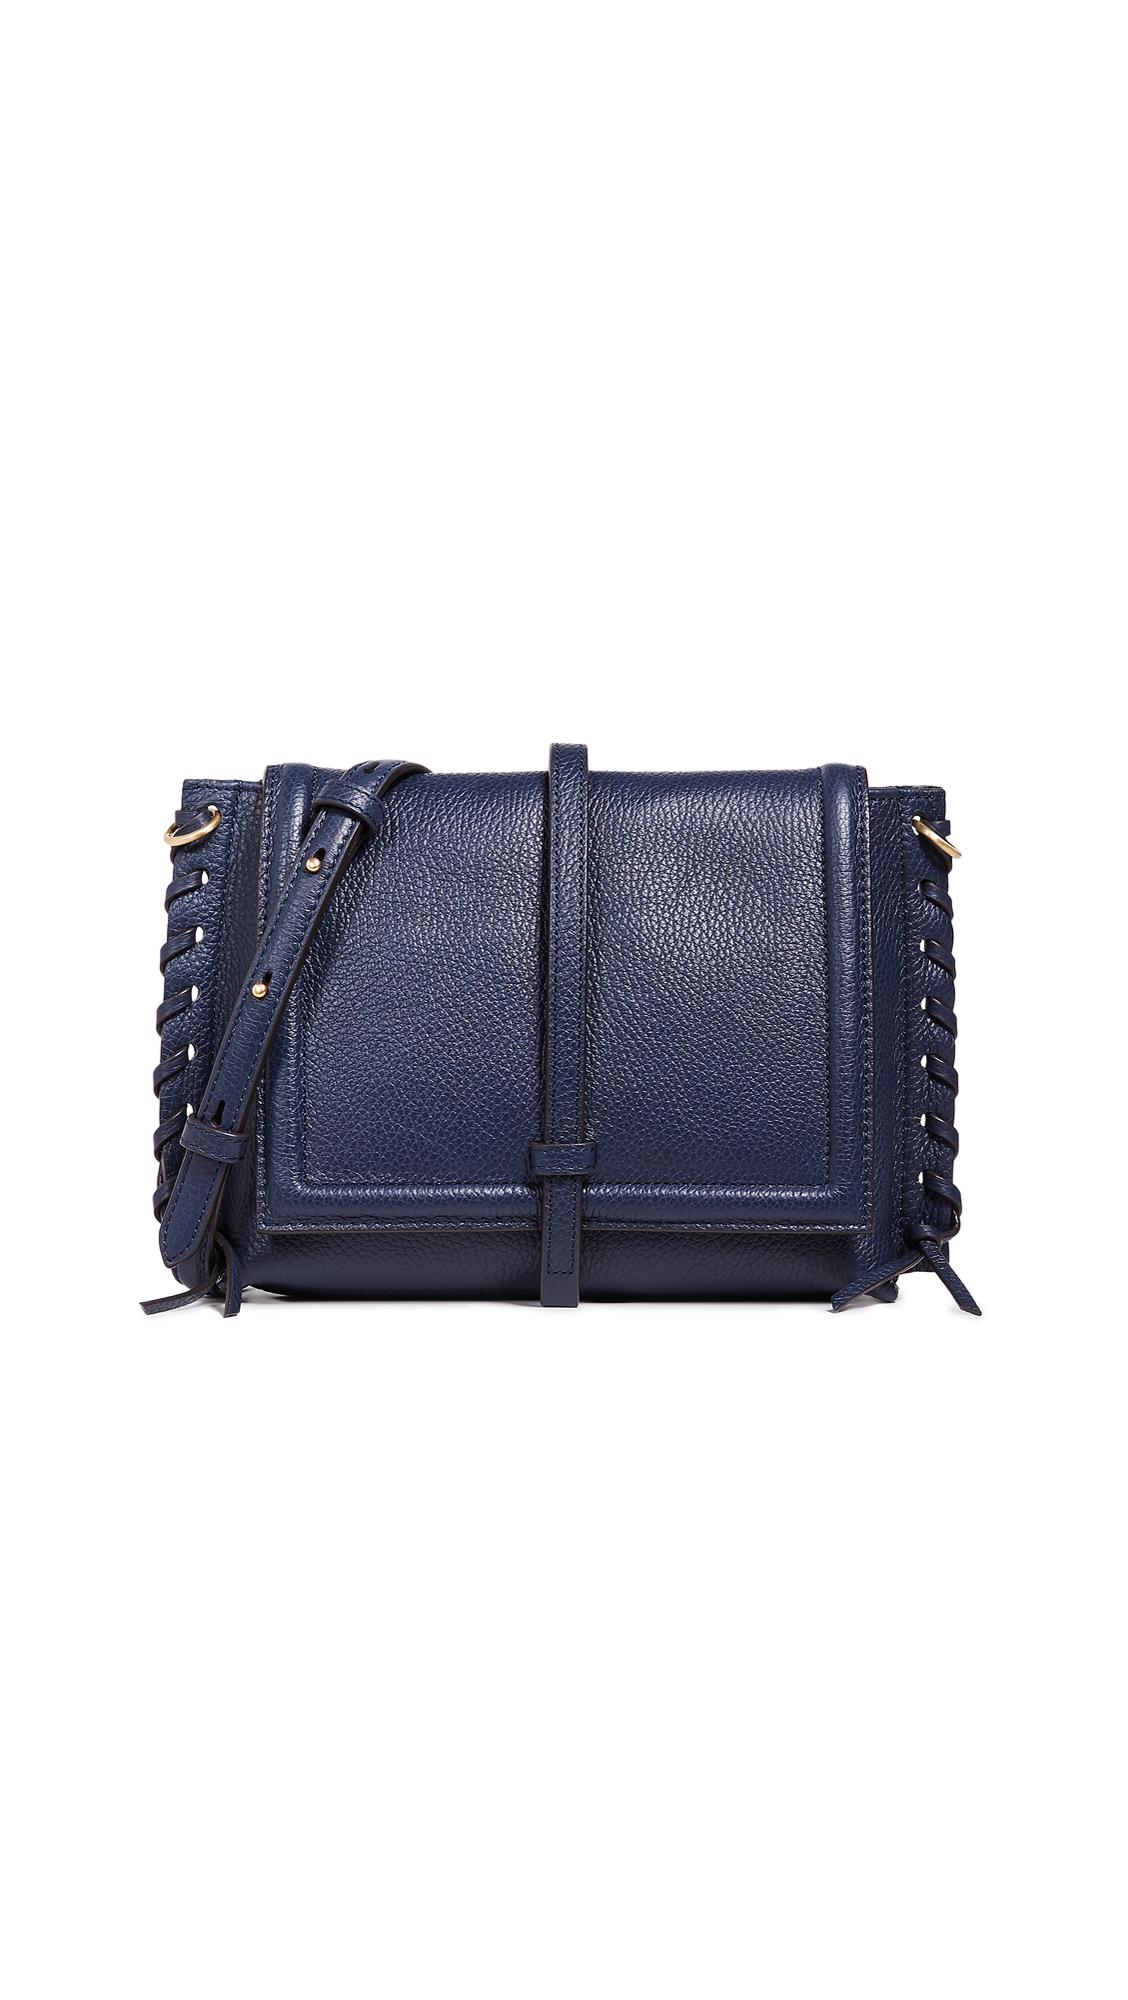 ANNABEL INGALL Elizabeth Saddle Bag in Navy